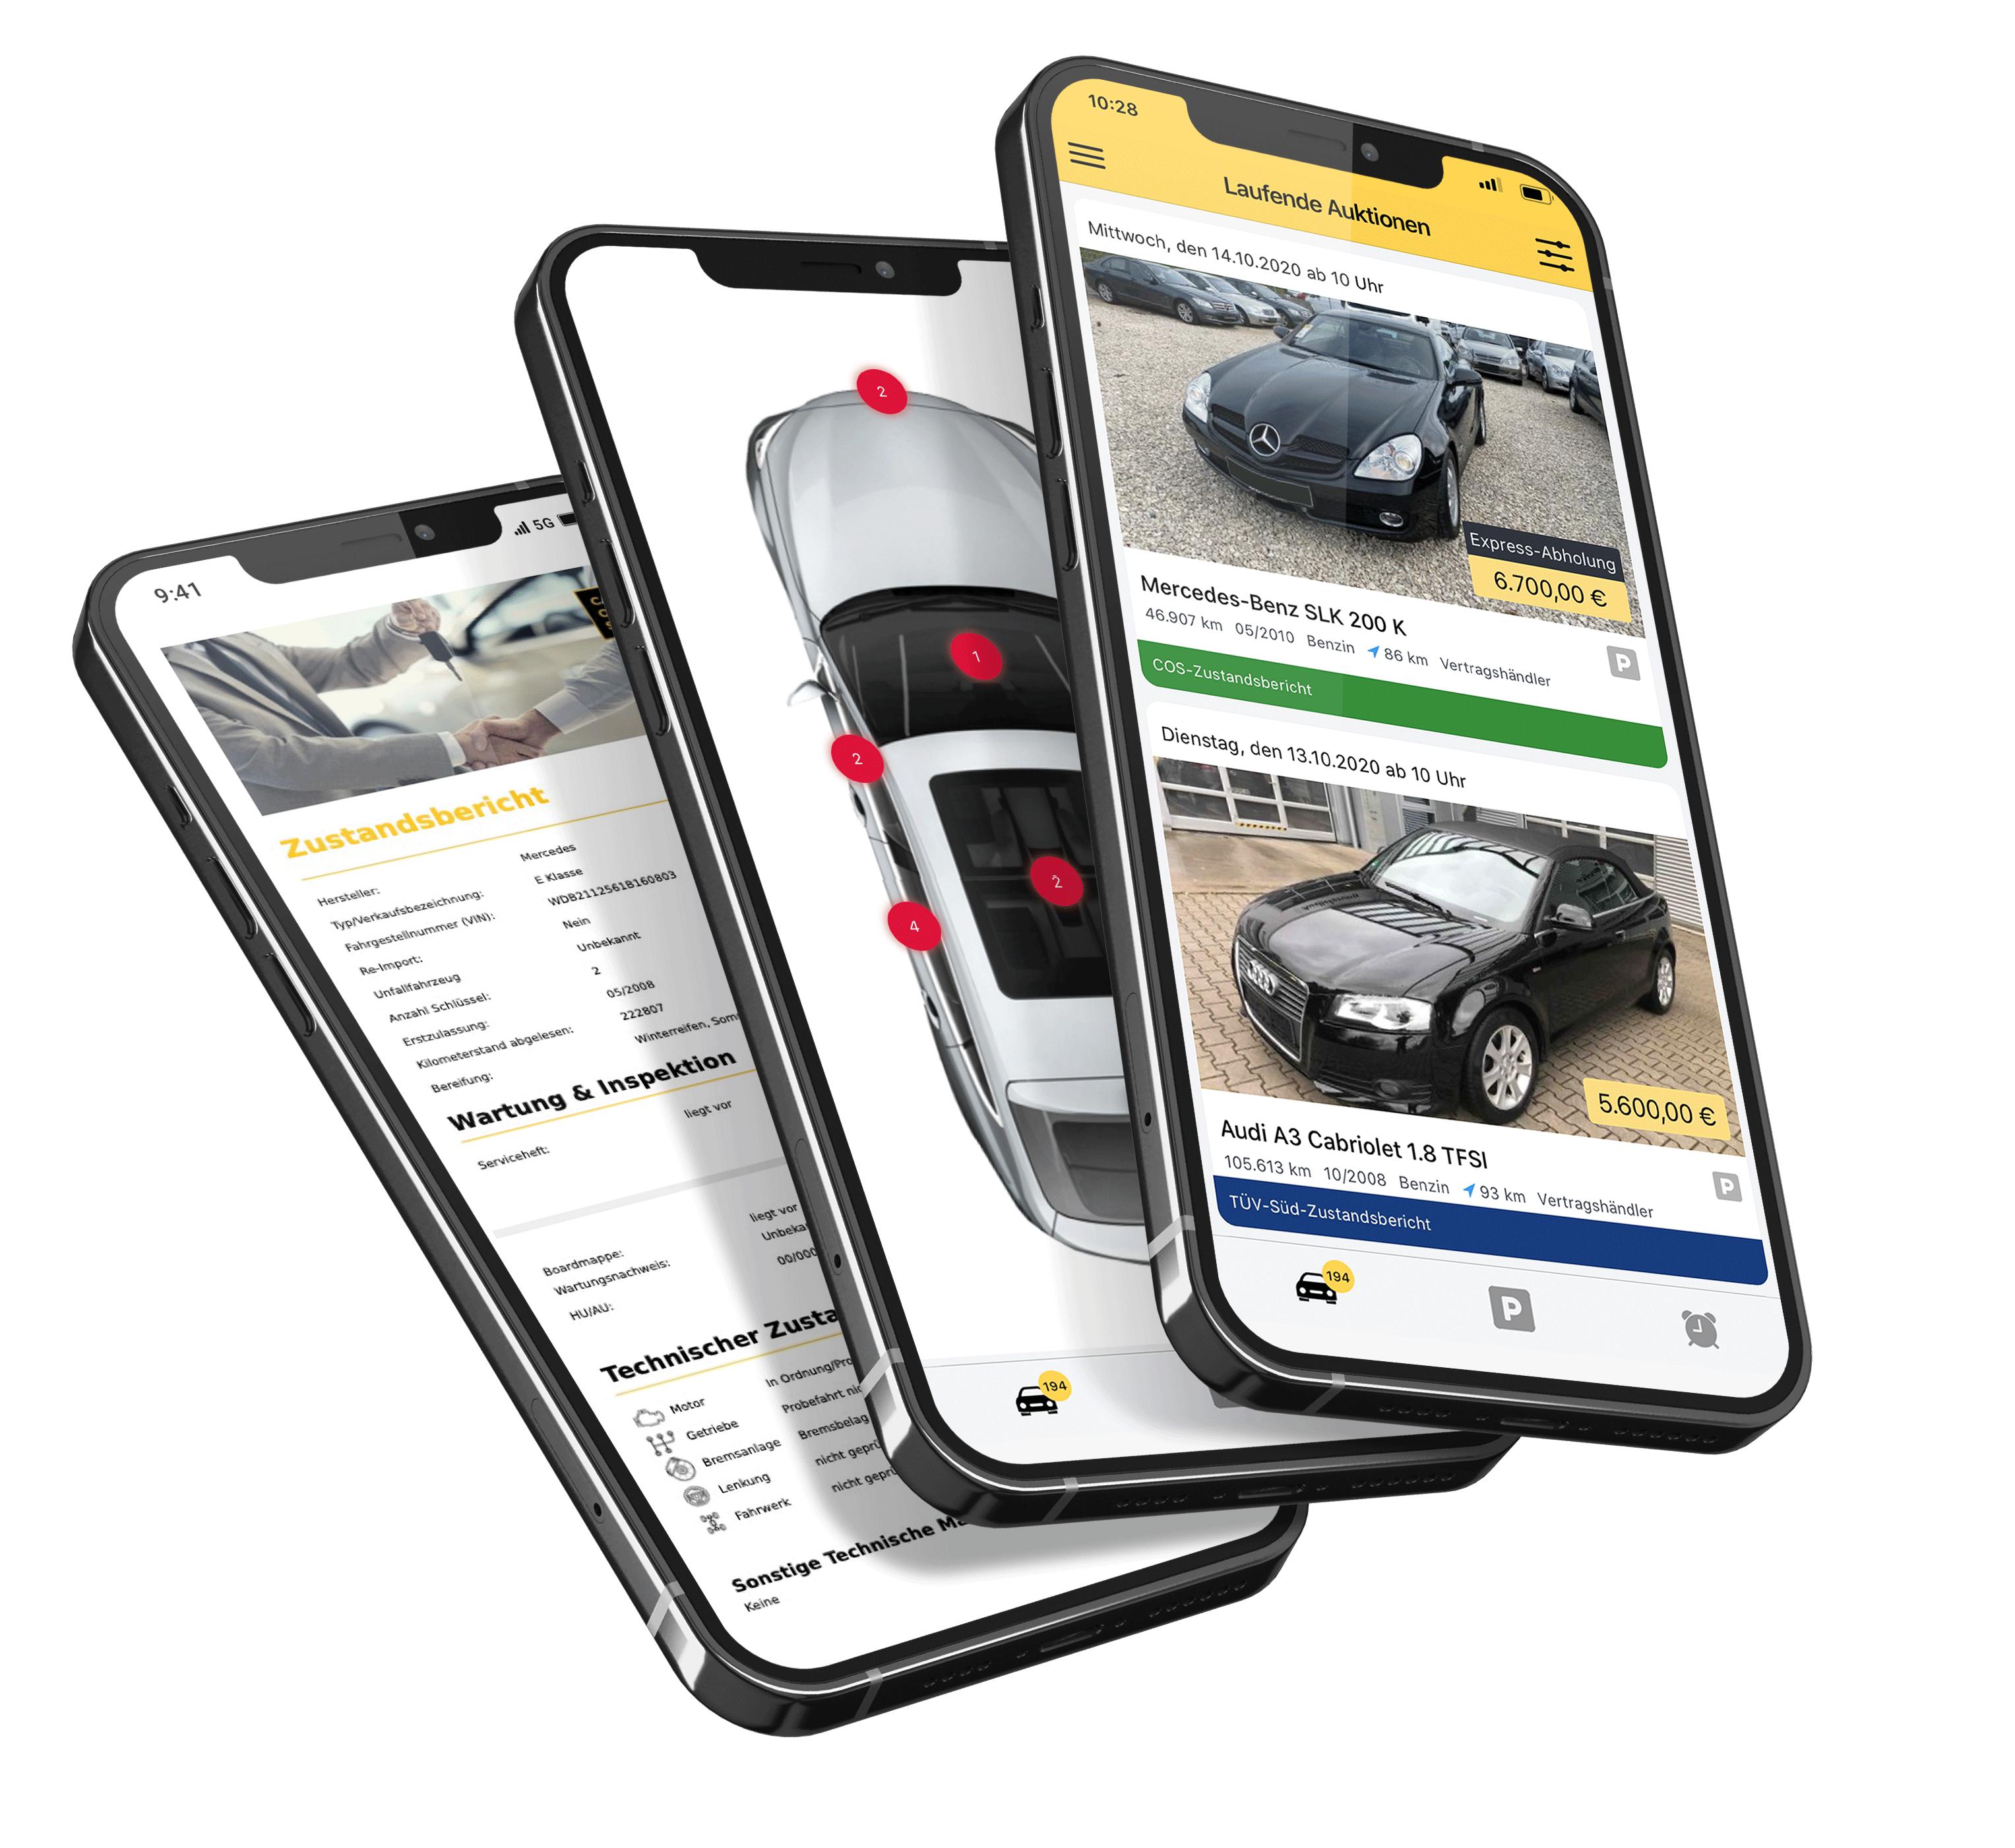 caronsale verschiedene mobile app ansichten